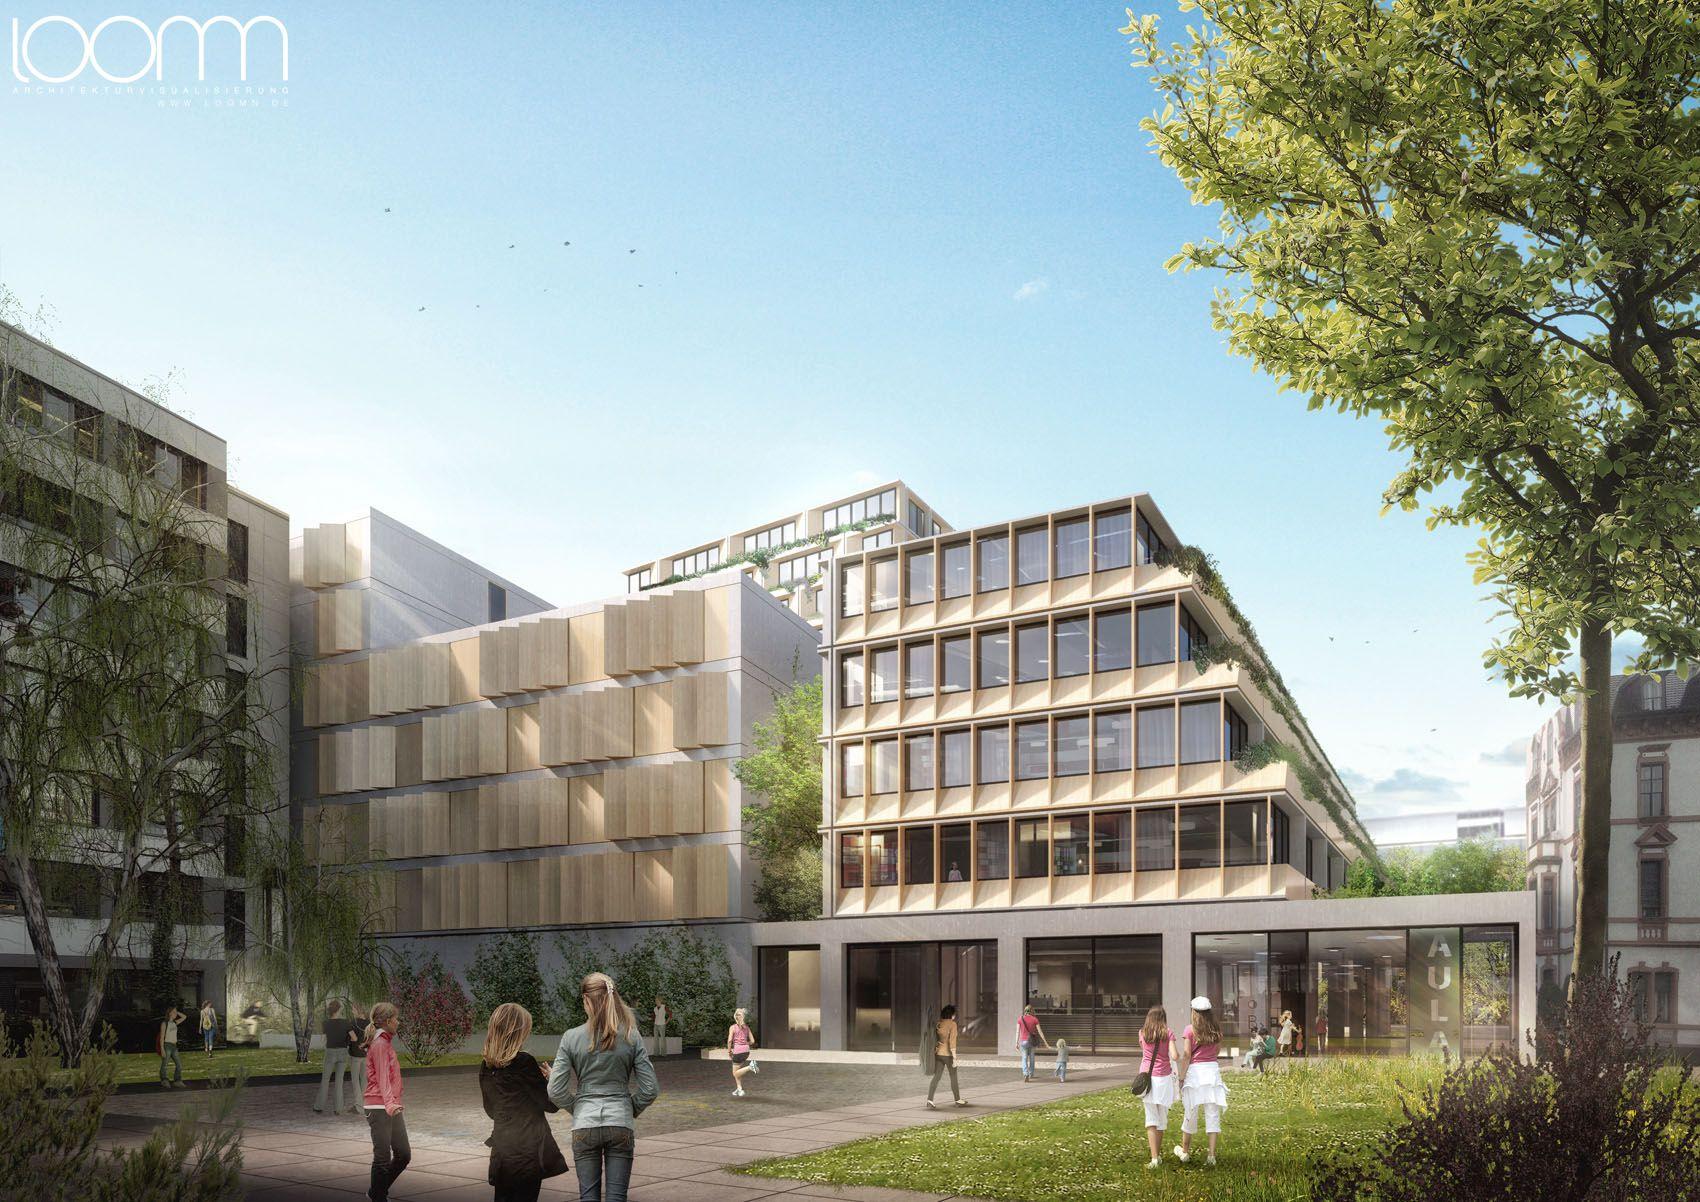 Architektur Freiburg kresings architektur freiburg volksbank freiburg bahnhofsachse